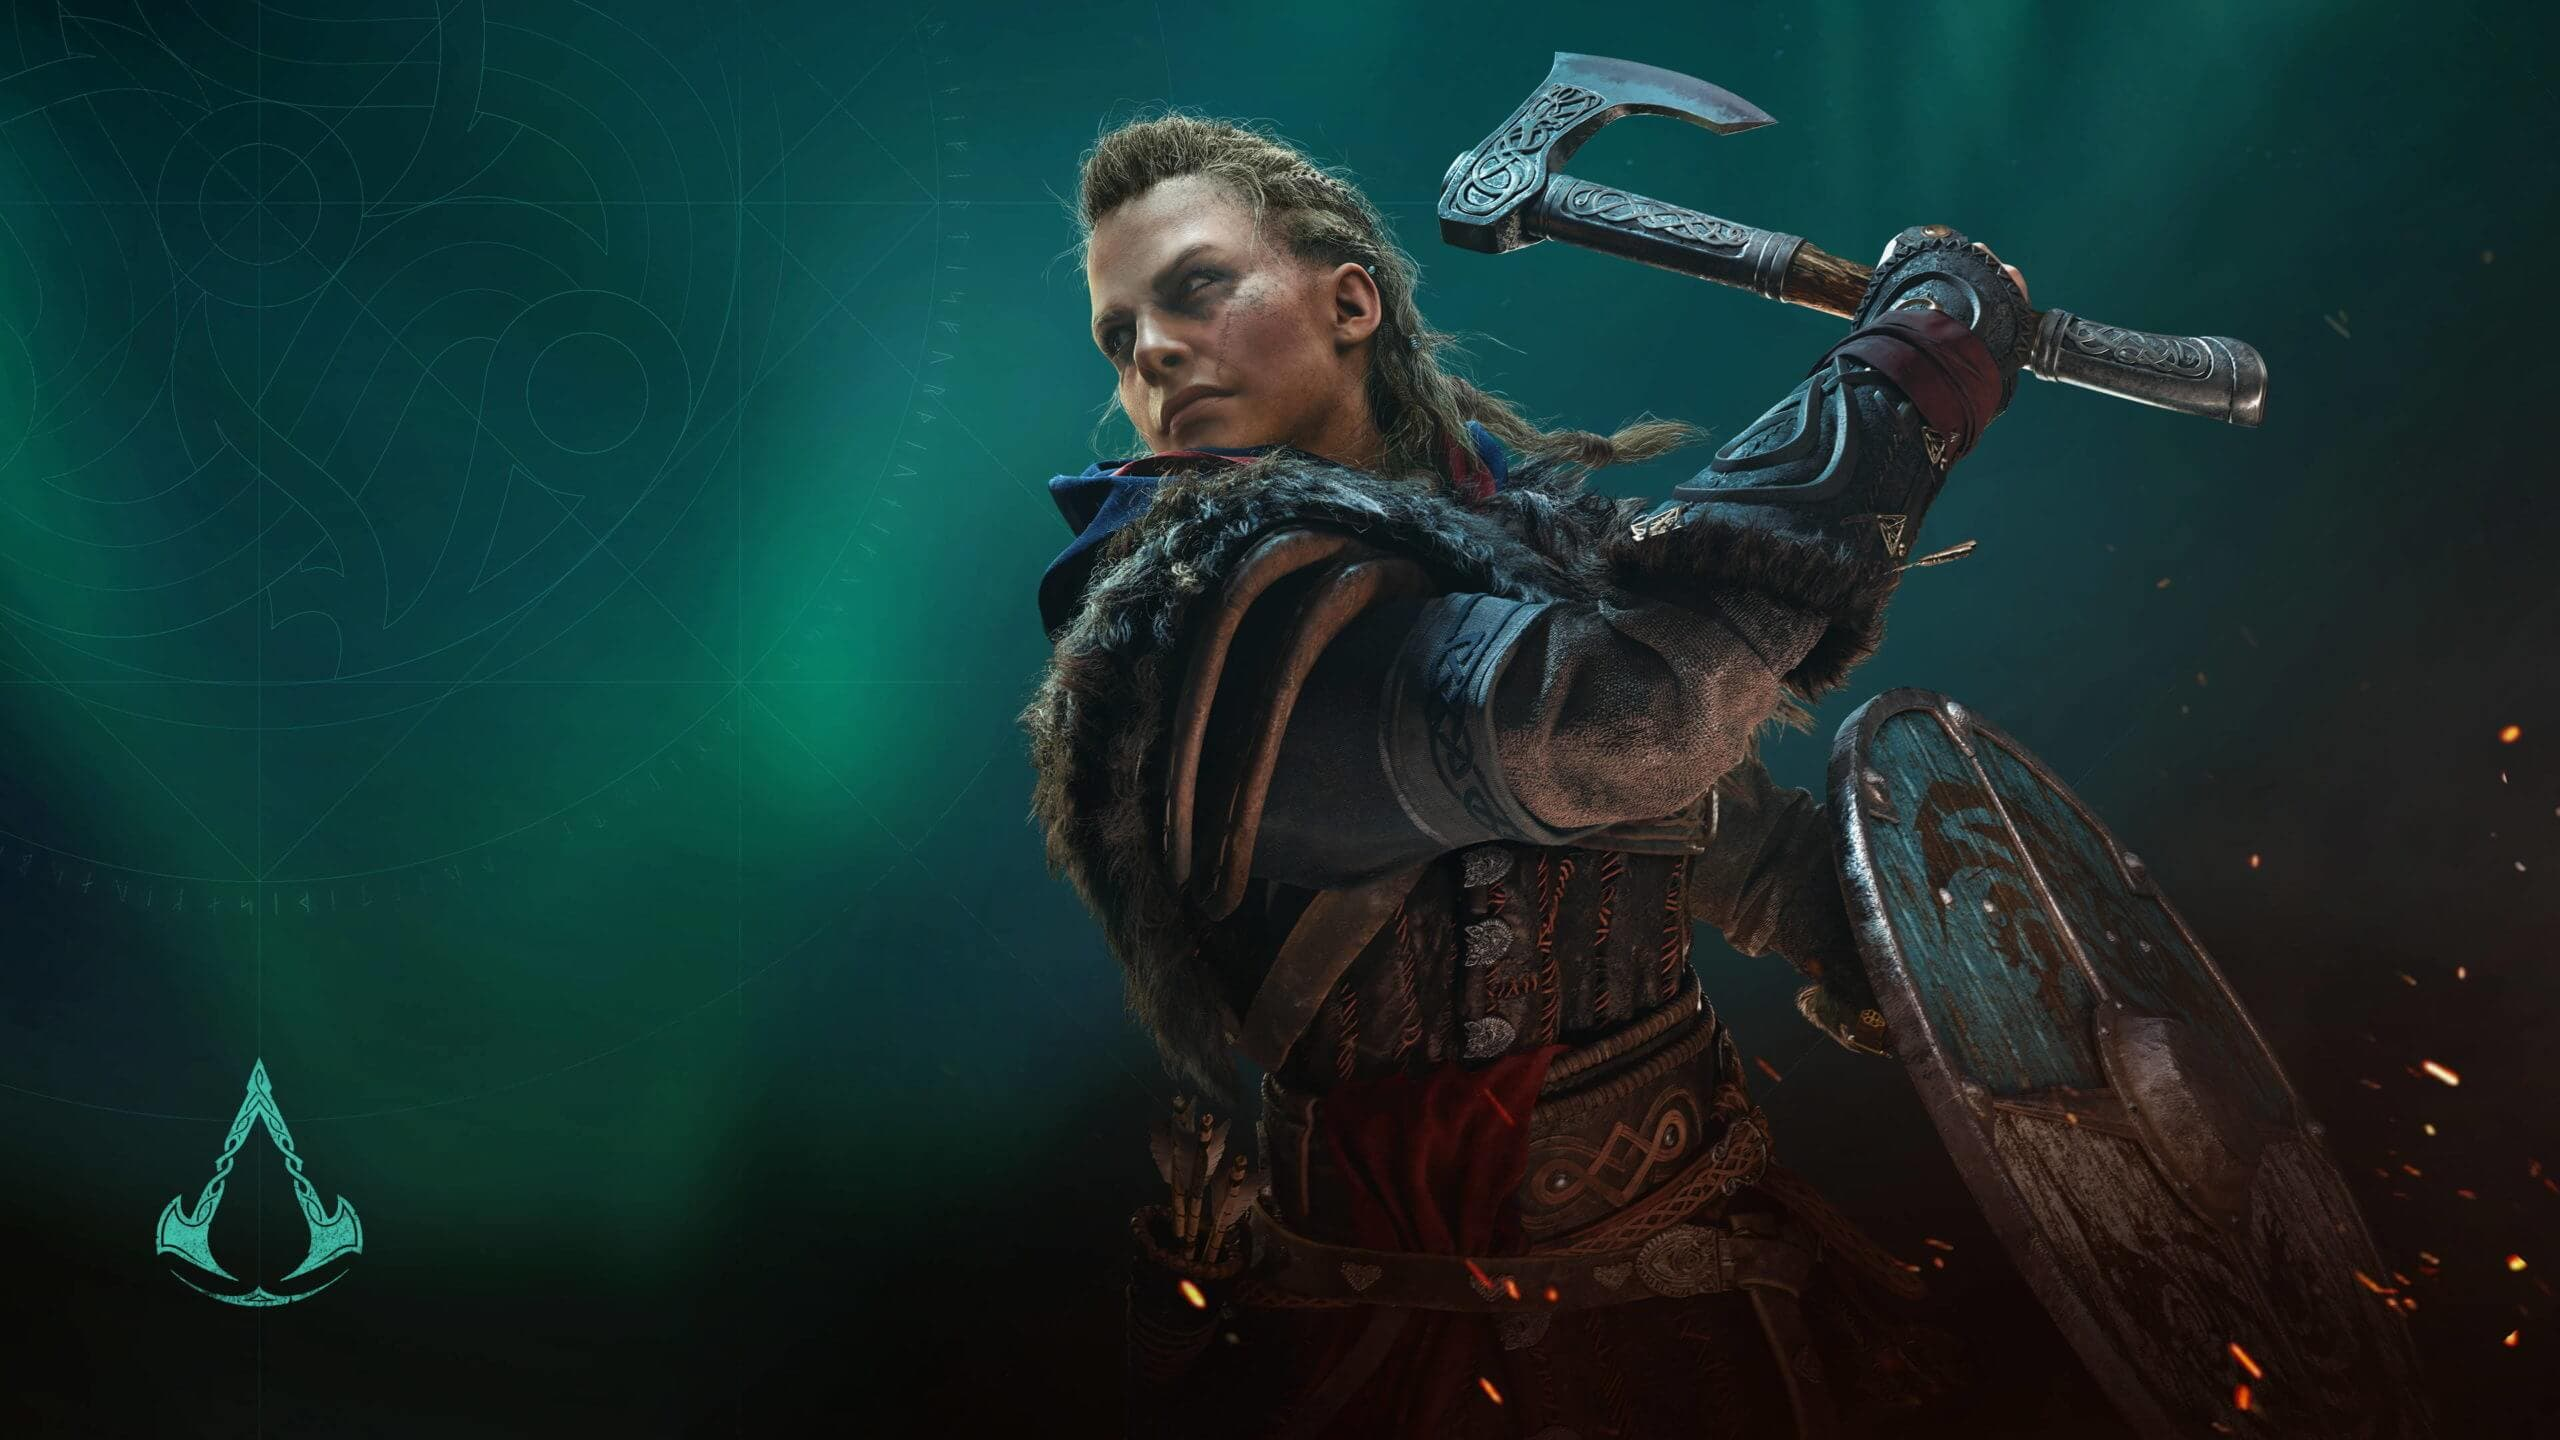 Filtran la Banda Sonora Oficial de Assassin's Creed Valhalla